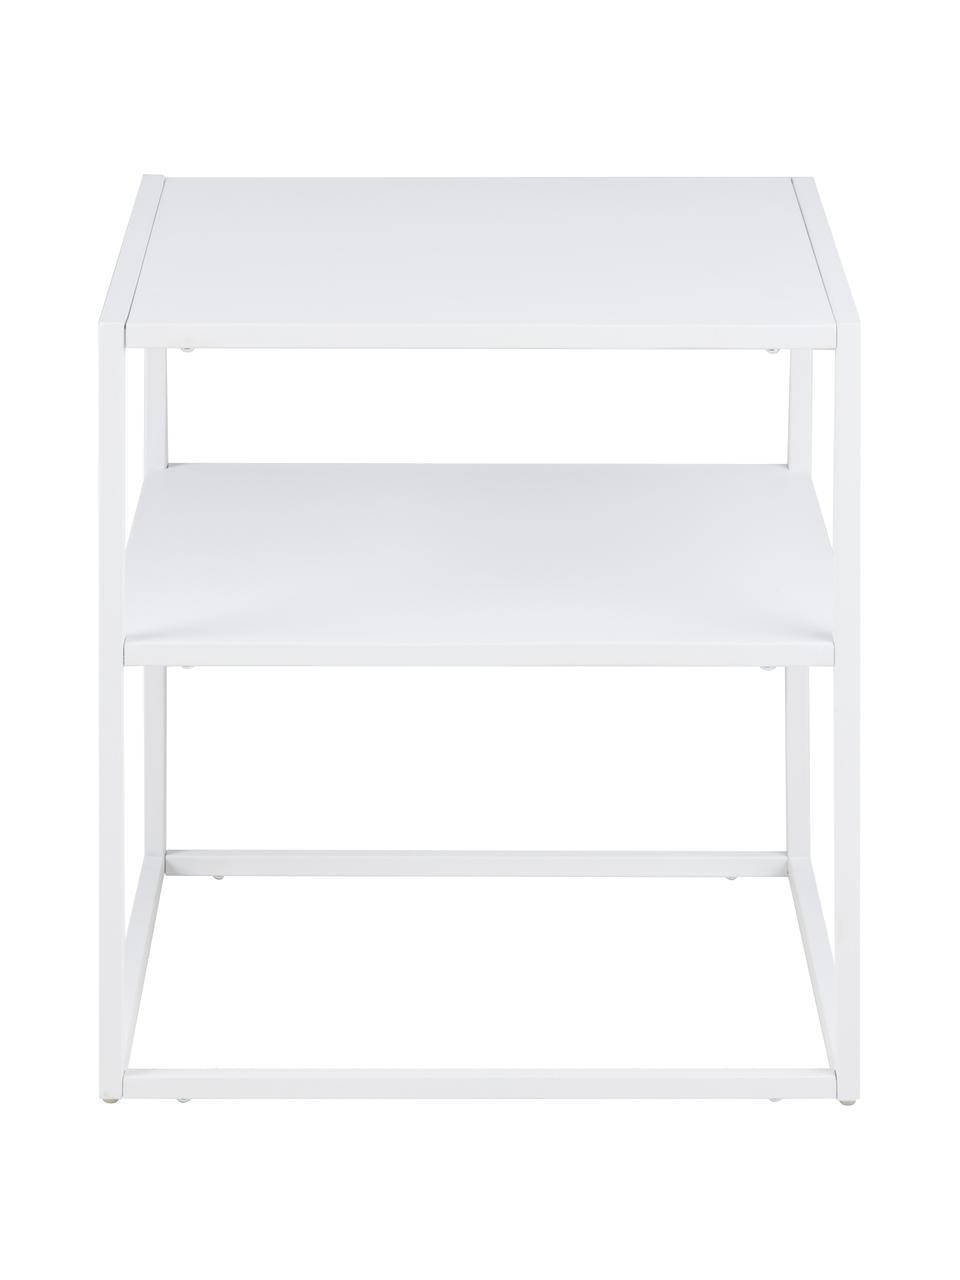 Tavolino in metallo bianco Newton, Metallo verniciato, Bianco, Larg. 45 x Prof. 40 cm